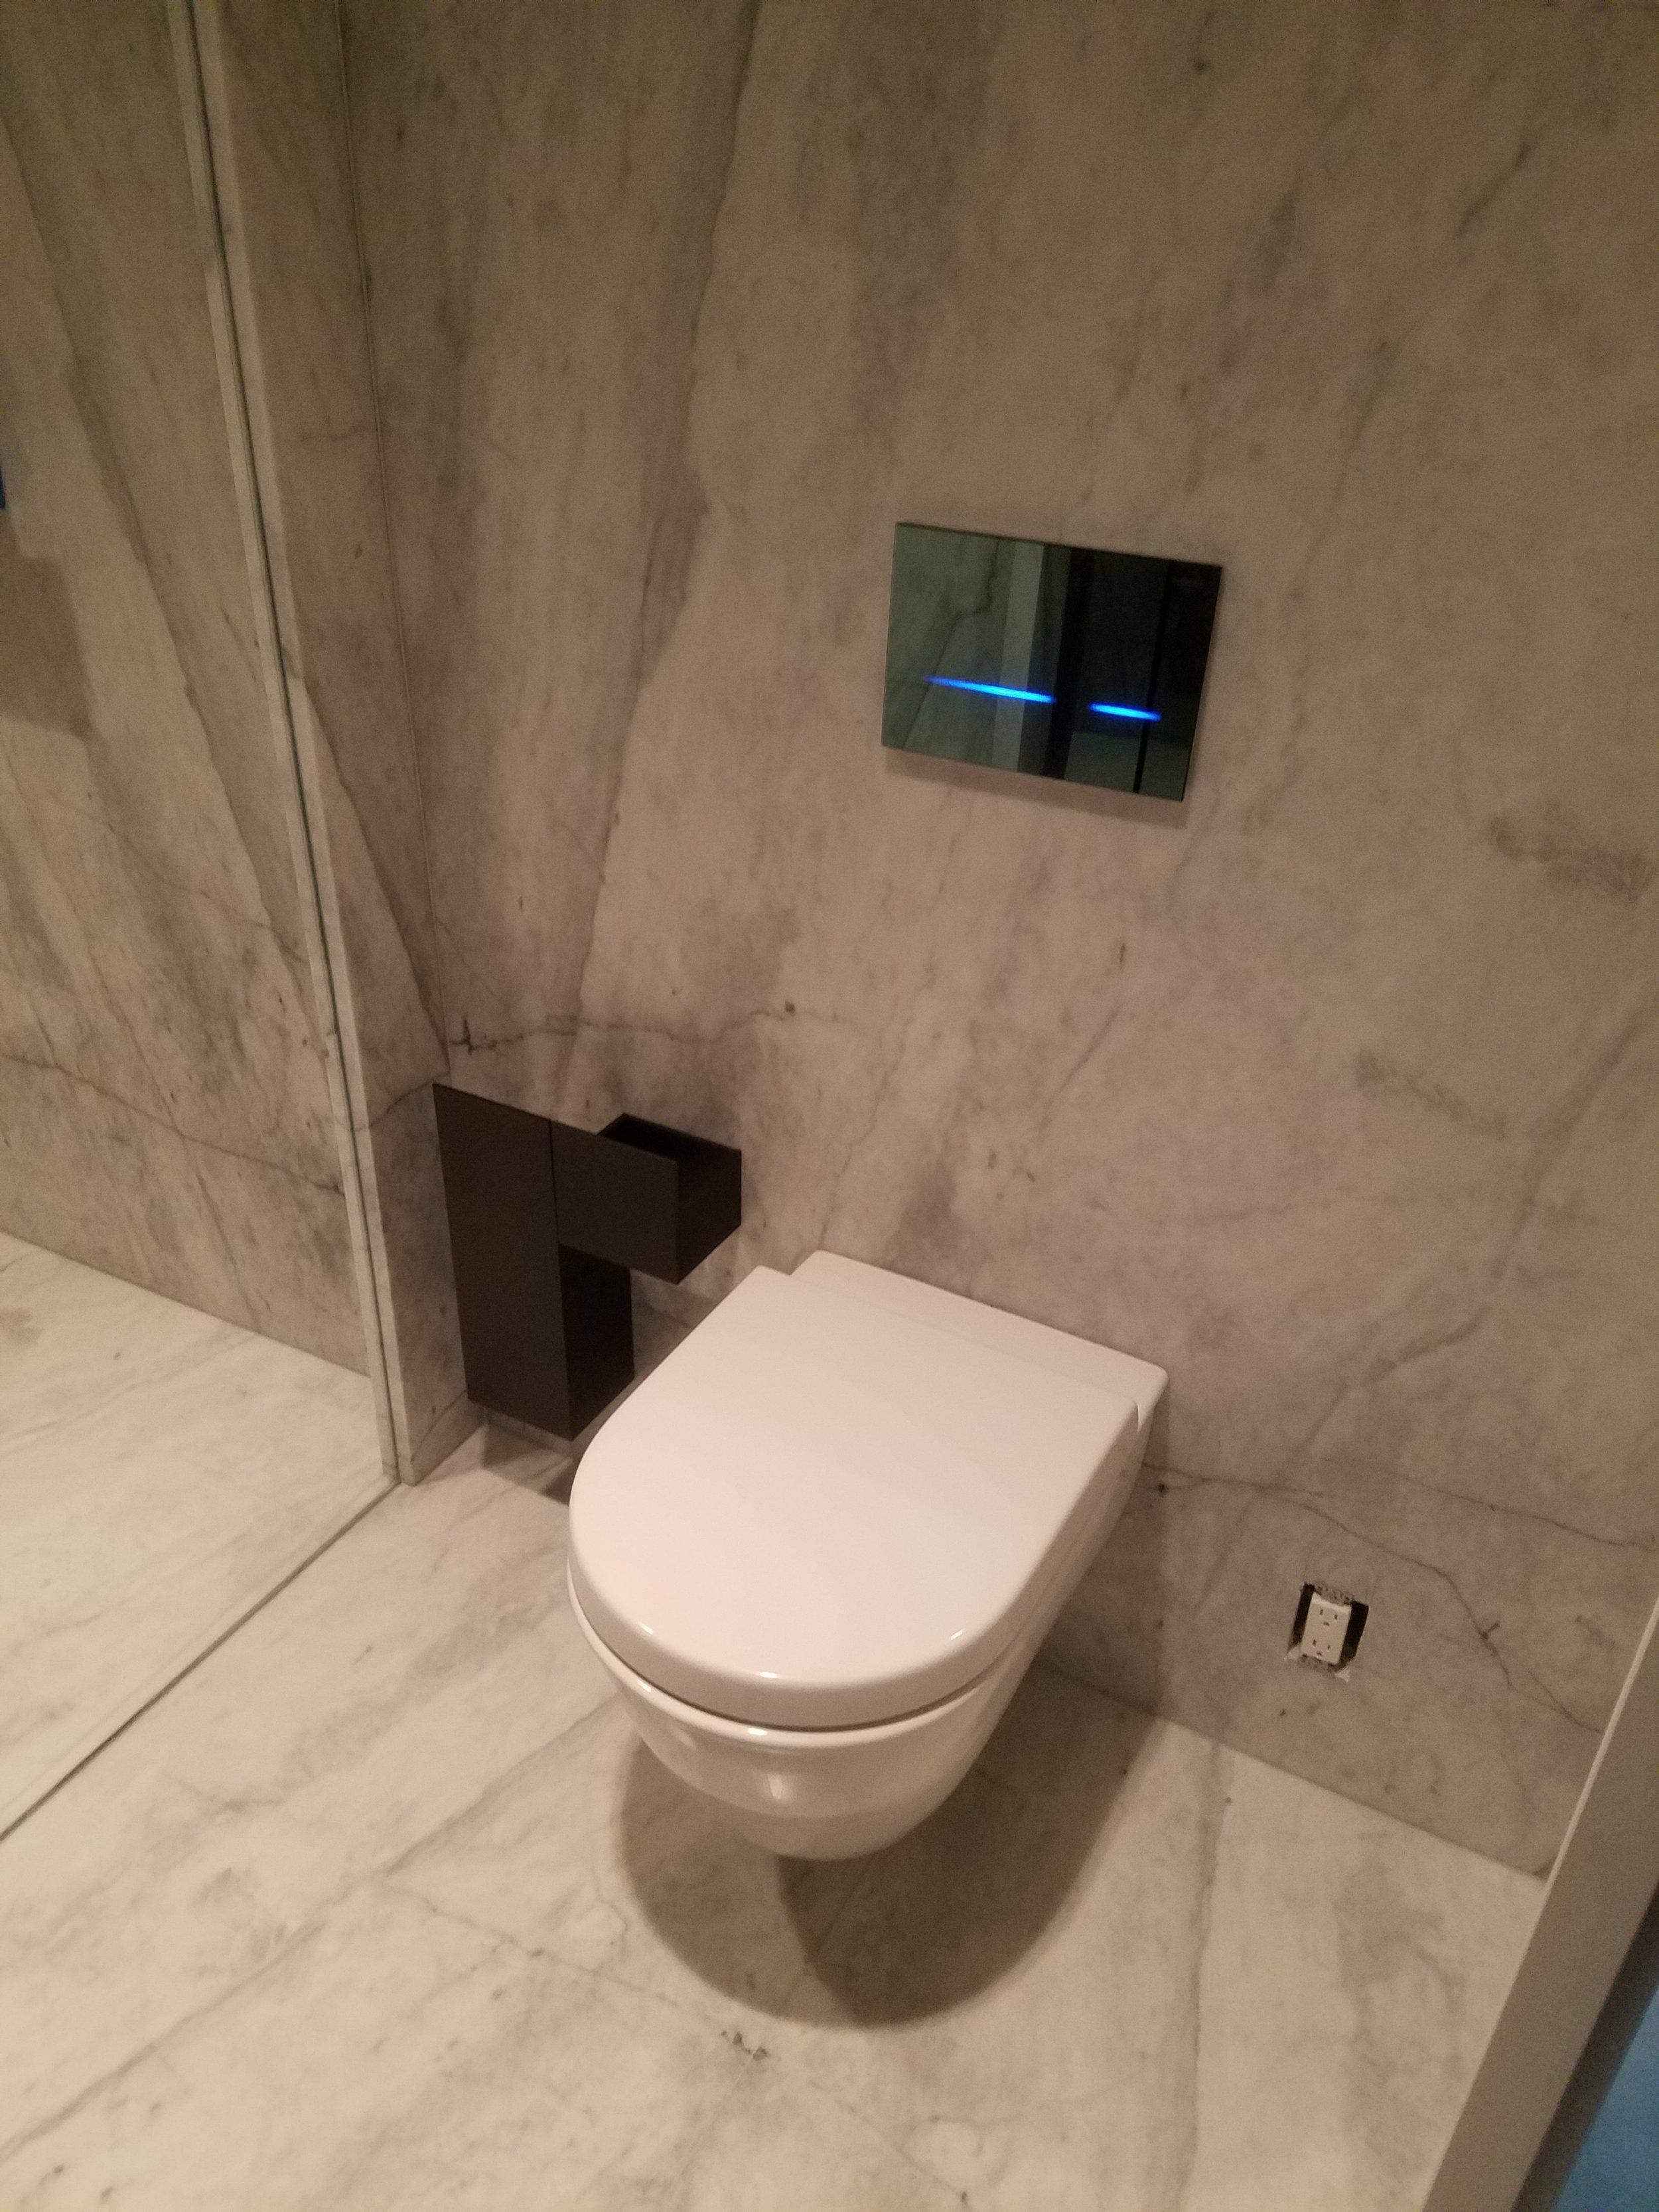 SIck toilet.jpg